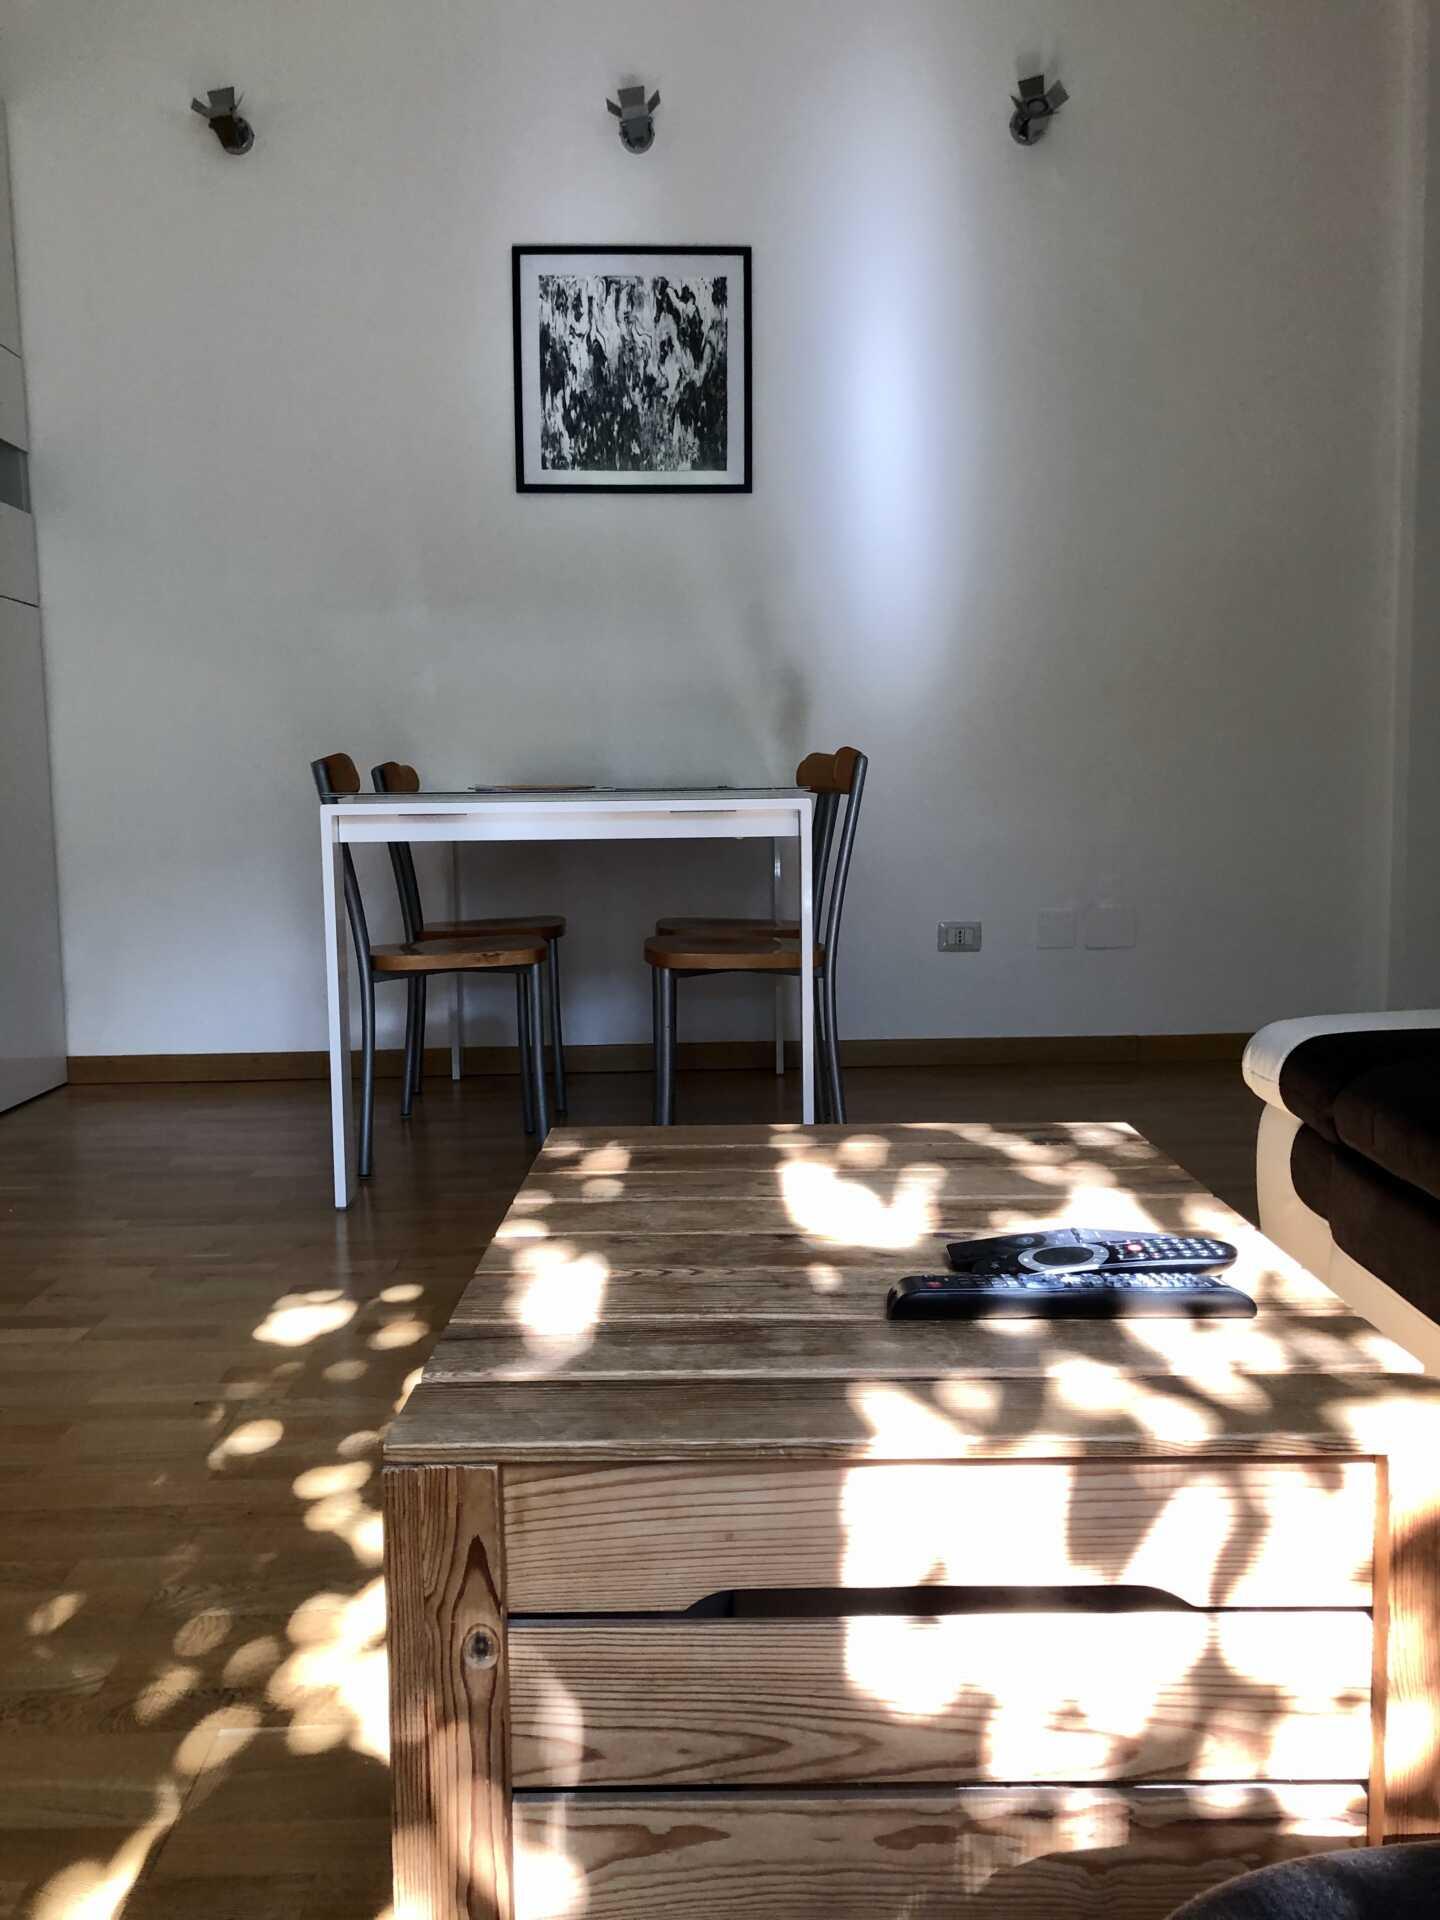 Case in vendita Milano Cermenate (19)